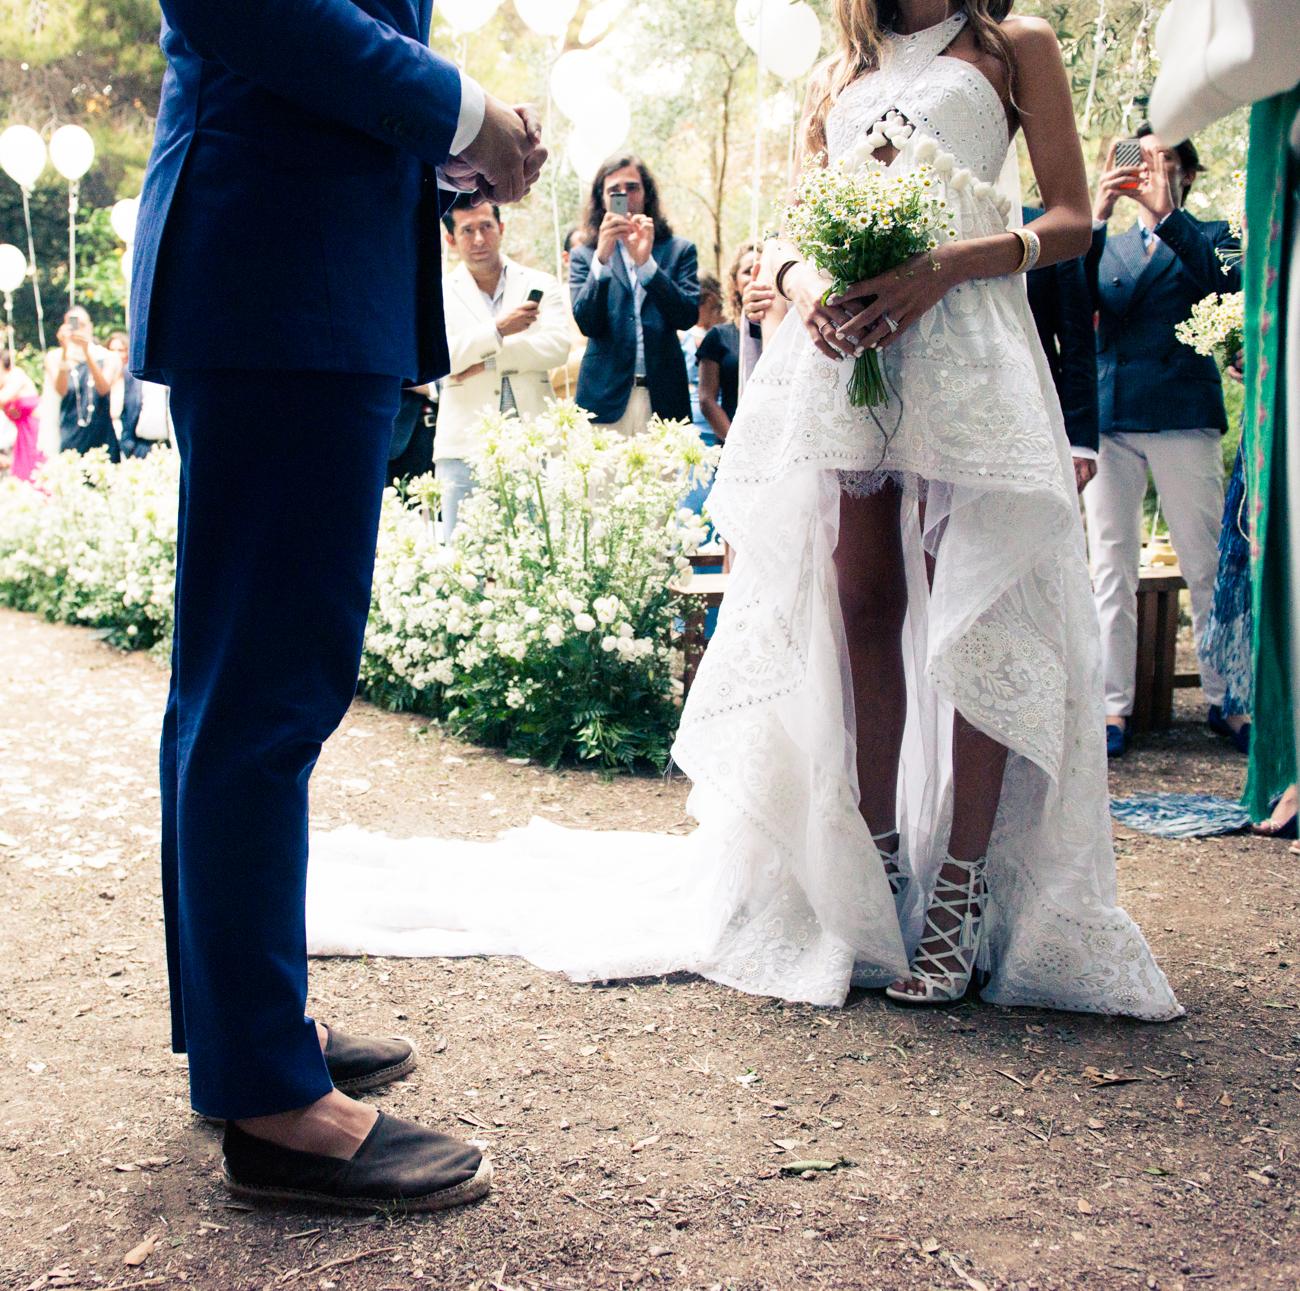 New York Times Wedding: Meet The New York Times Wedding Columnist